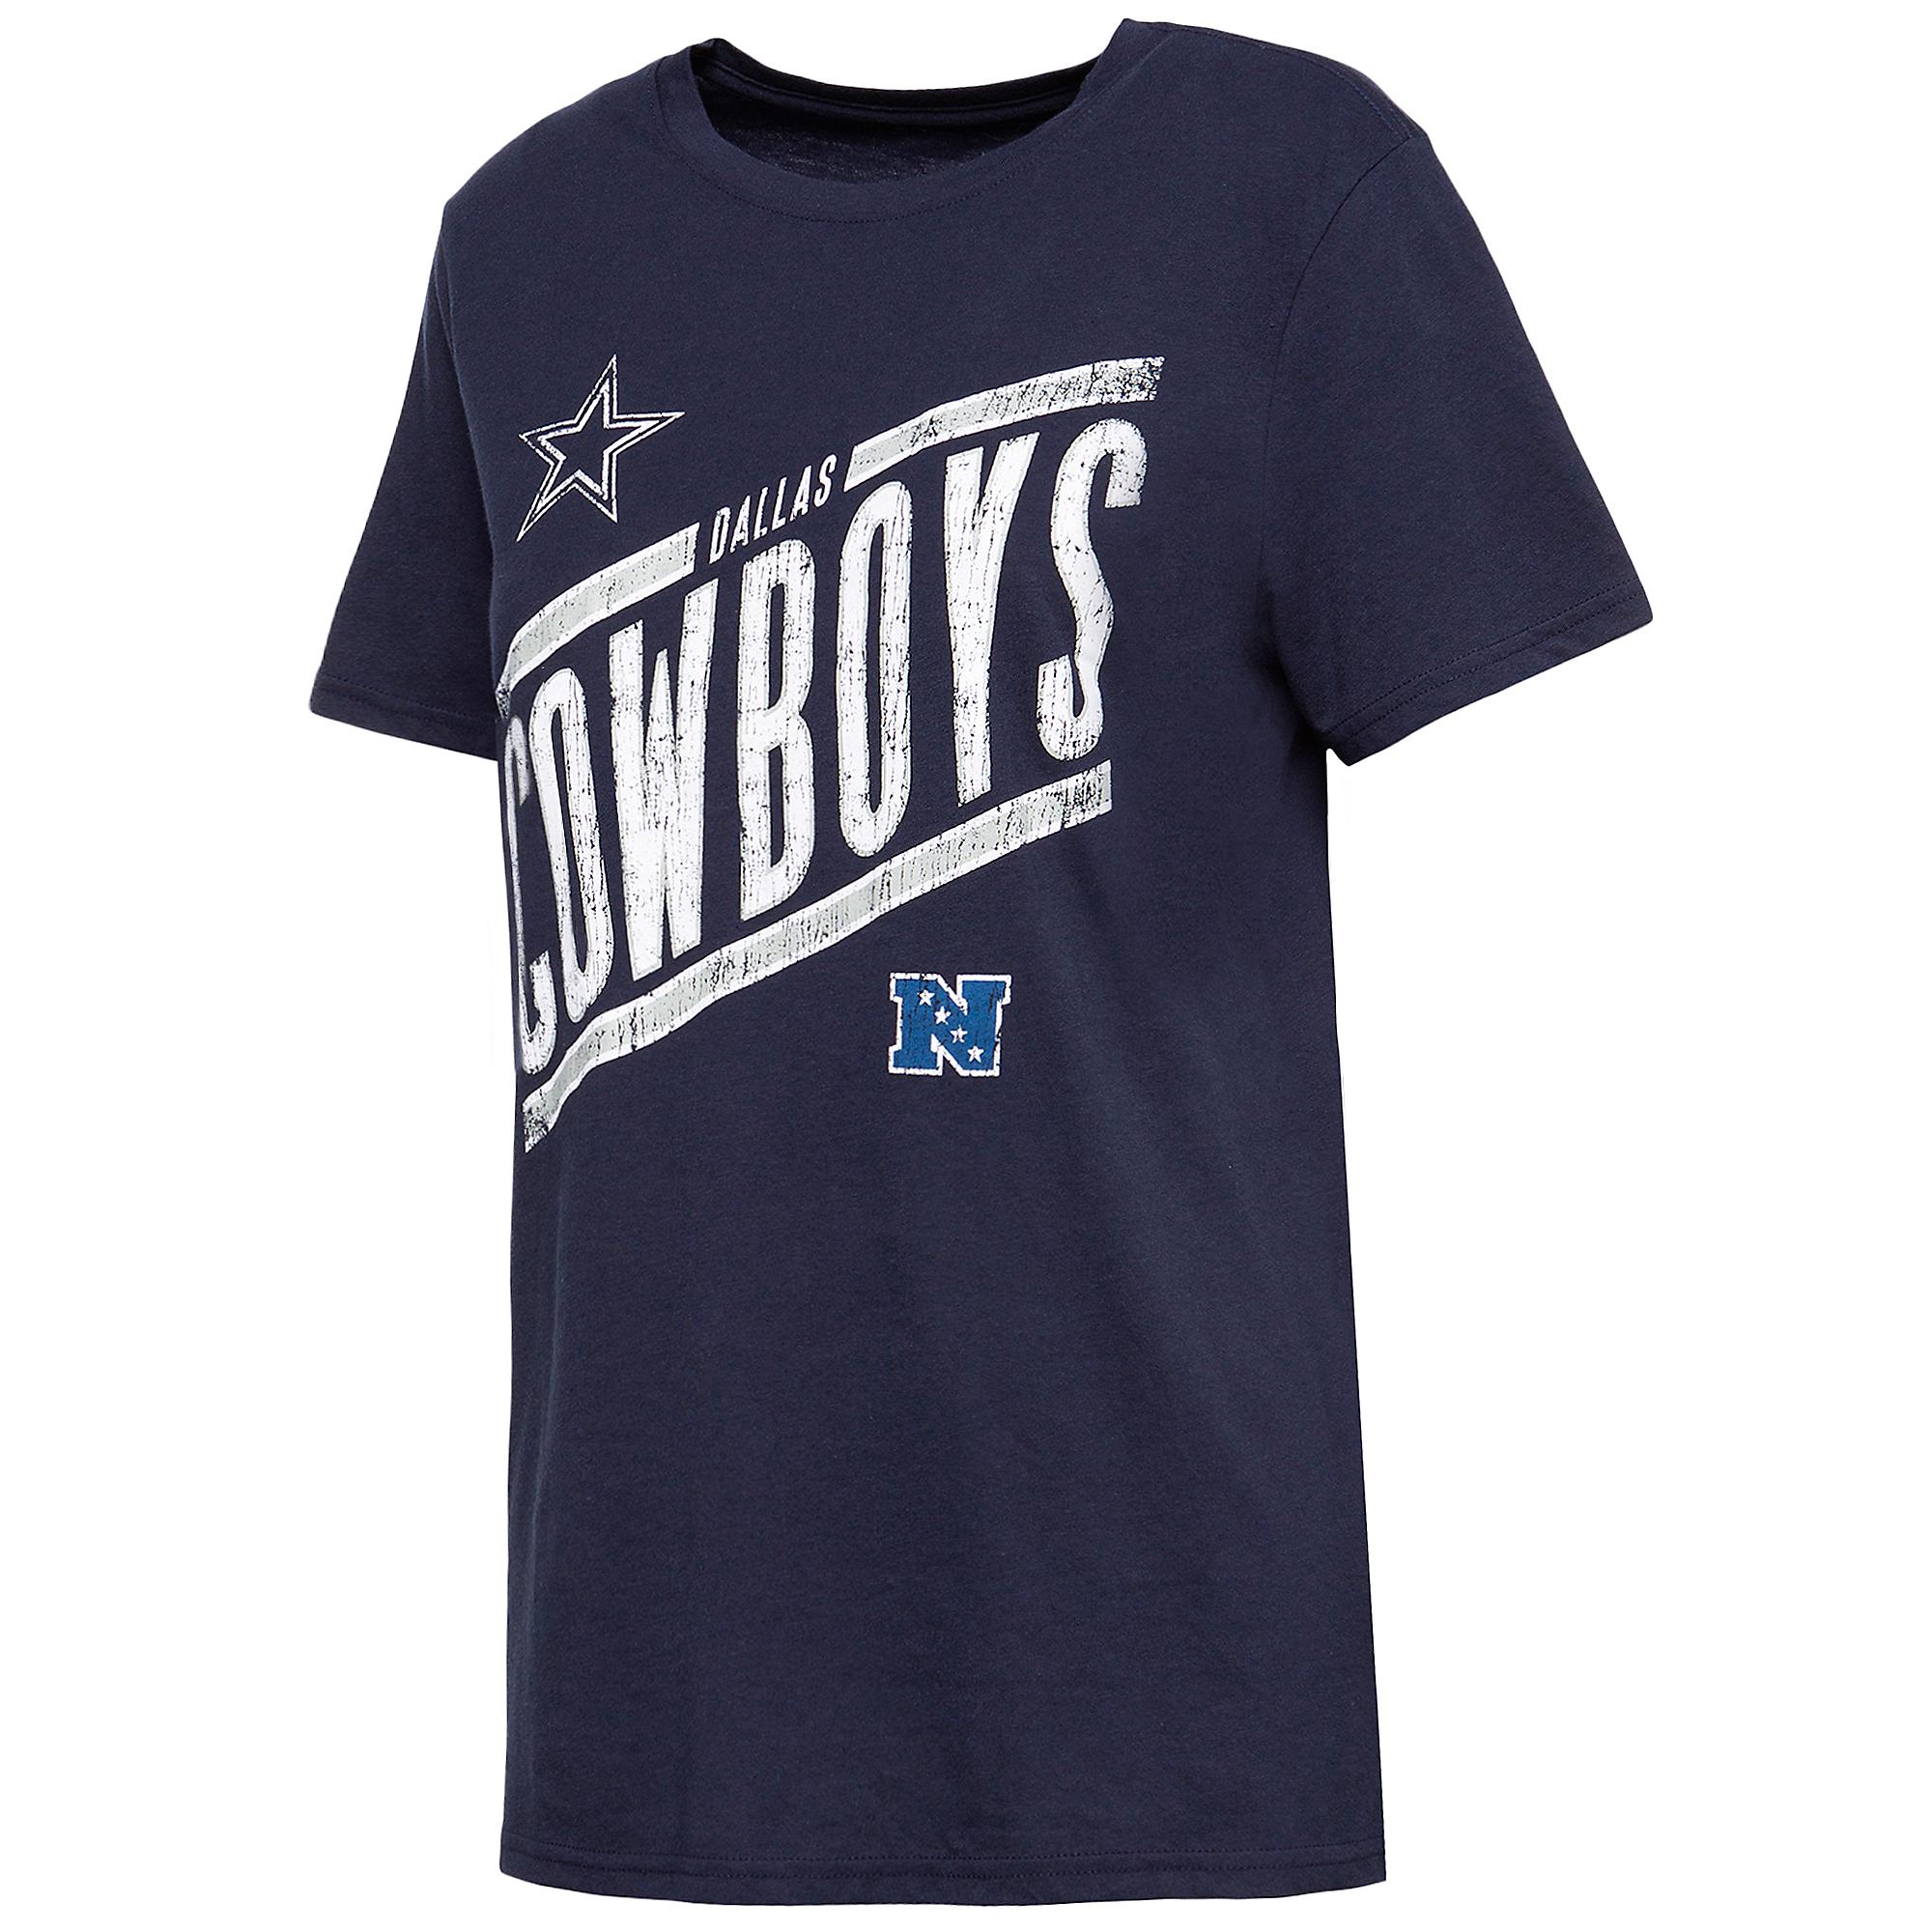 Dallas Cowboys Womens Harwood NFC Short Sleeve T-Shirt